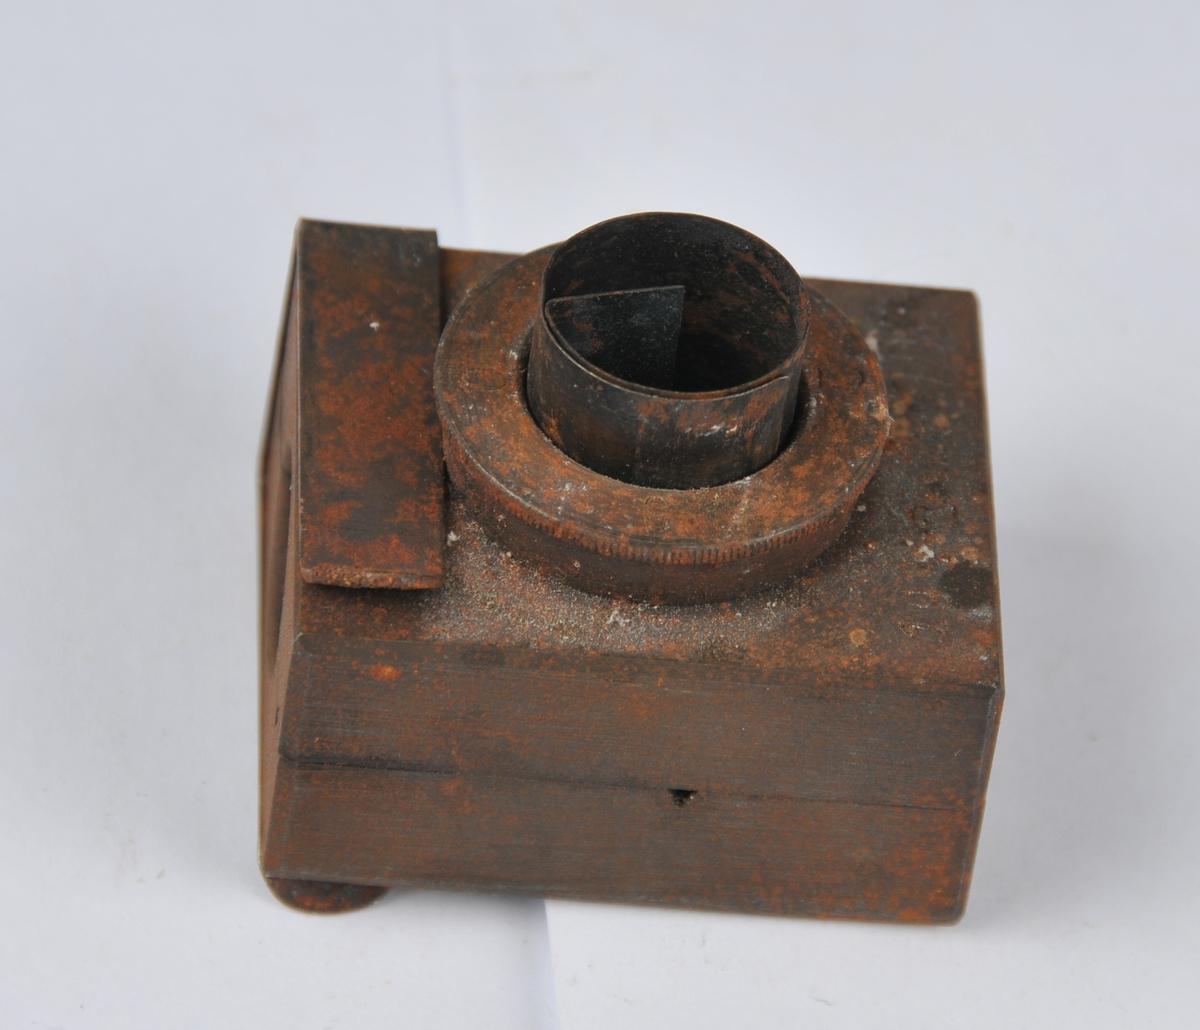 Støypeform i jern med trakt.